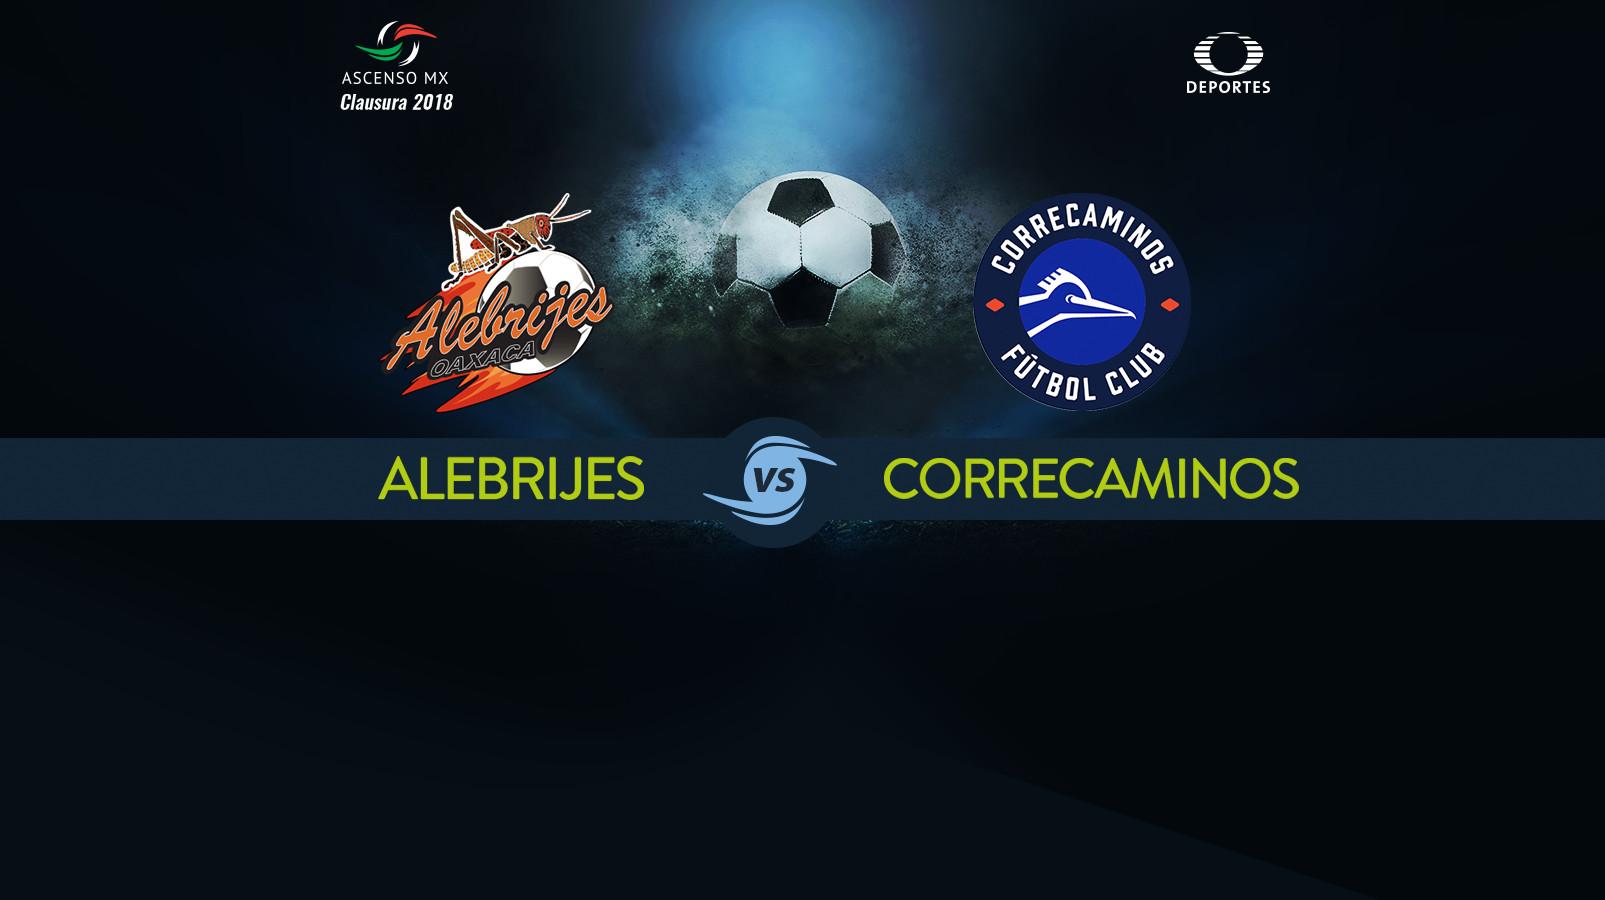 Alebrijes vs Correcaminos en Vivo 2018 Ascenso MX 2018